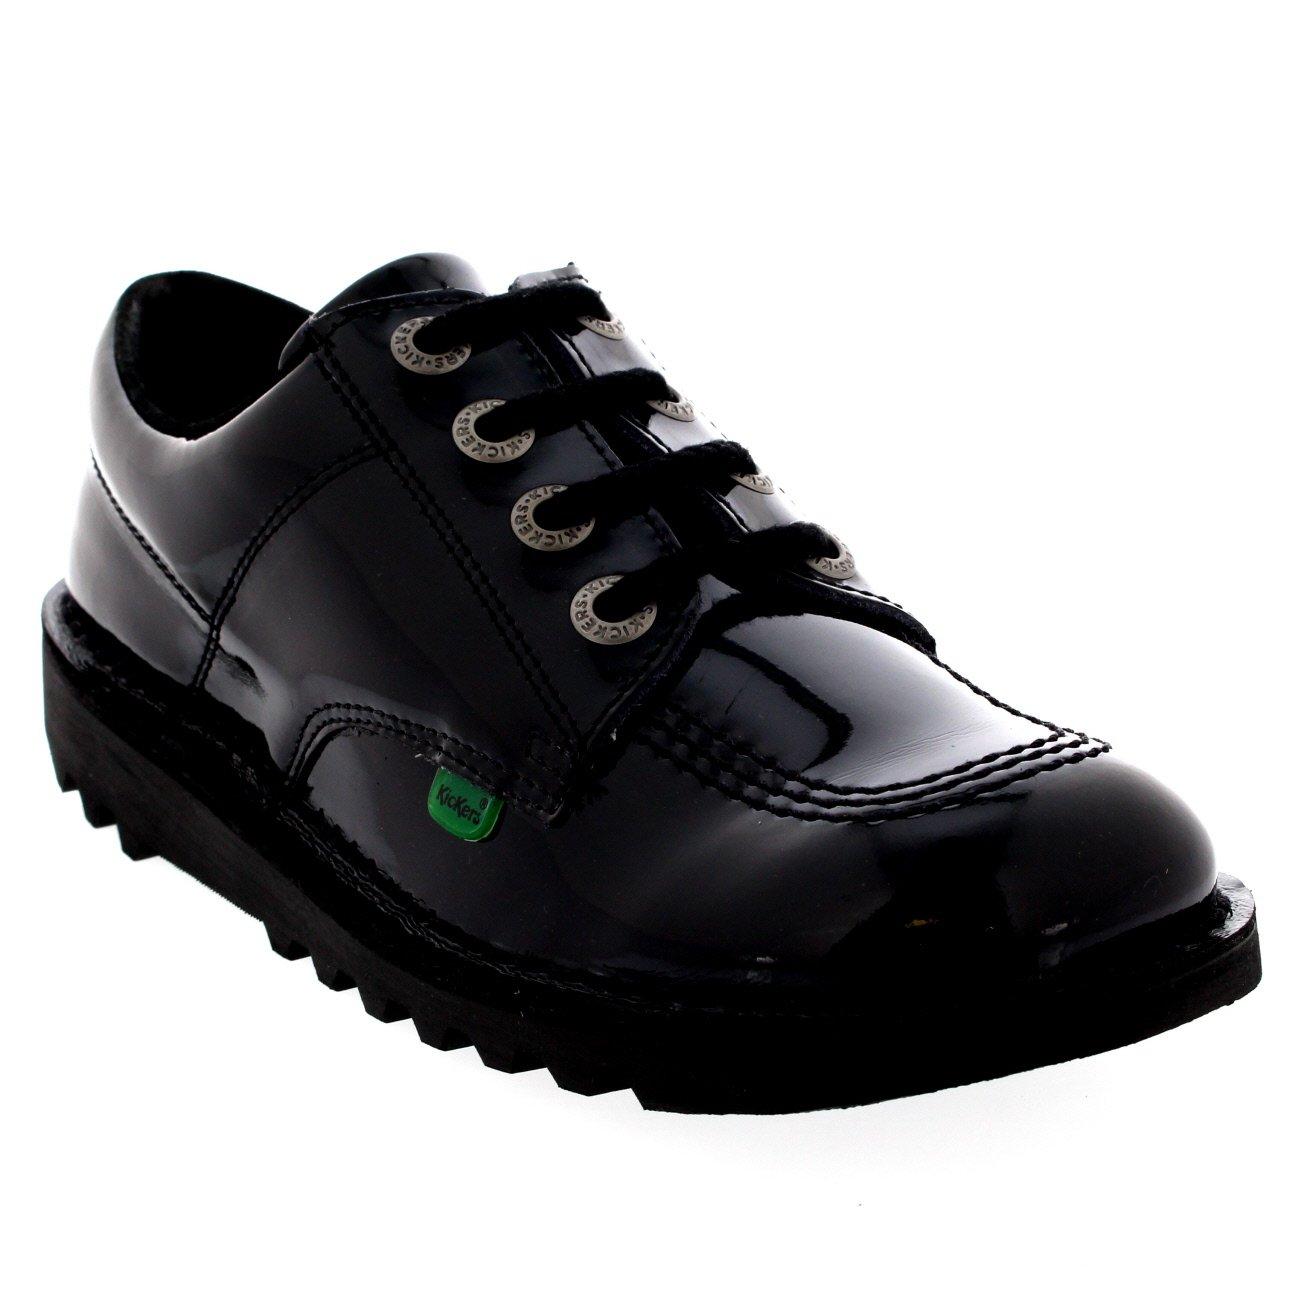 Kickers Womens Kick Lo Core Lace Up Work Office Patent Black Shoes - Black/Black - 5.5